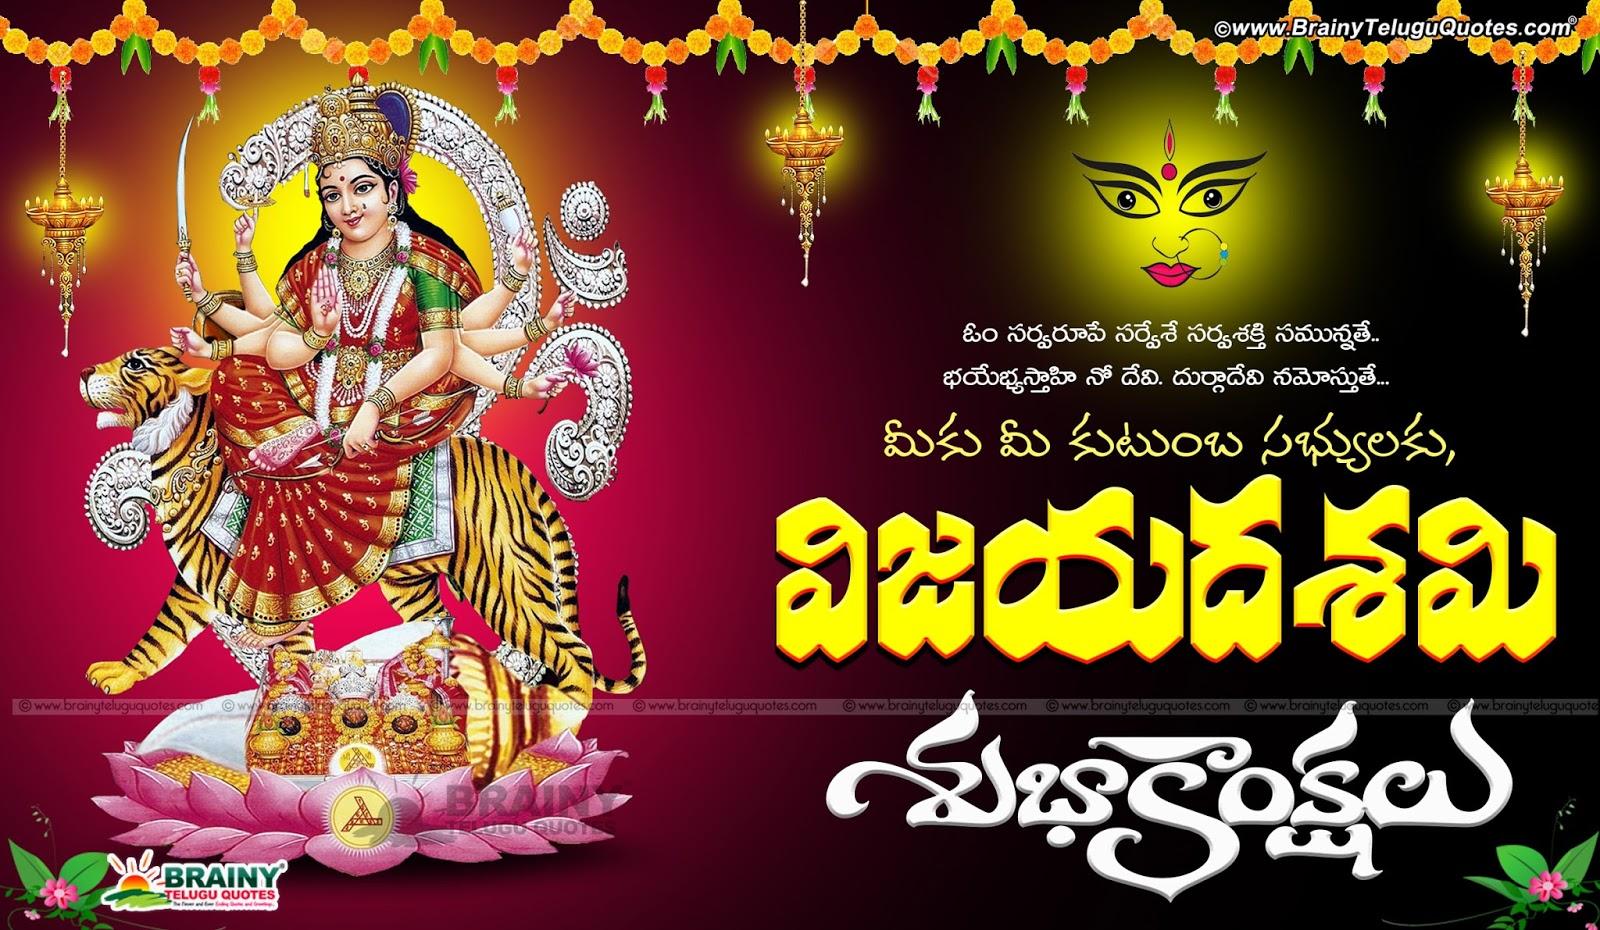 Happy advance vijayadasami dasara telugu wishes quotes messages sms happy advance vijayadasami dasara telugu wishes quotes messages sms images whatsapp status m4hsunfo